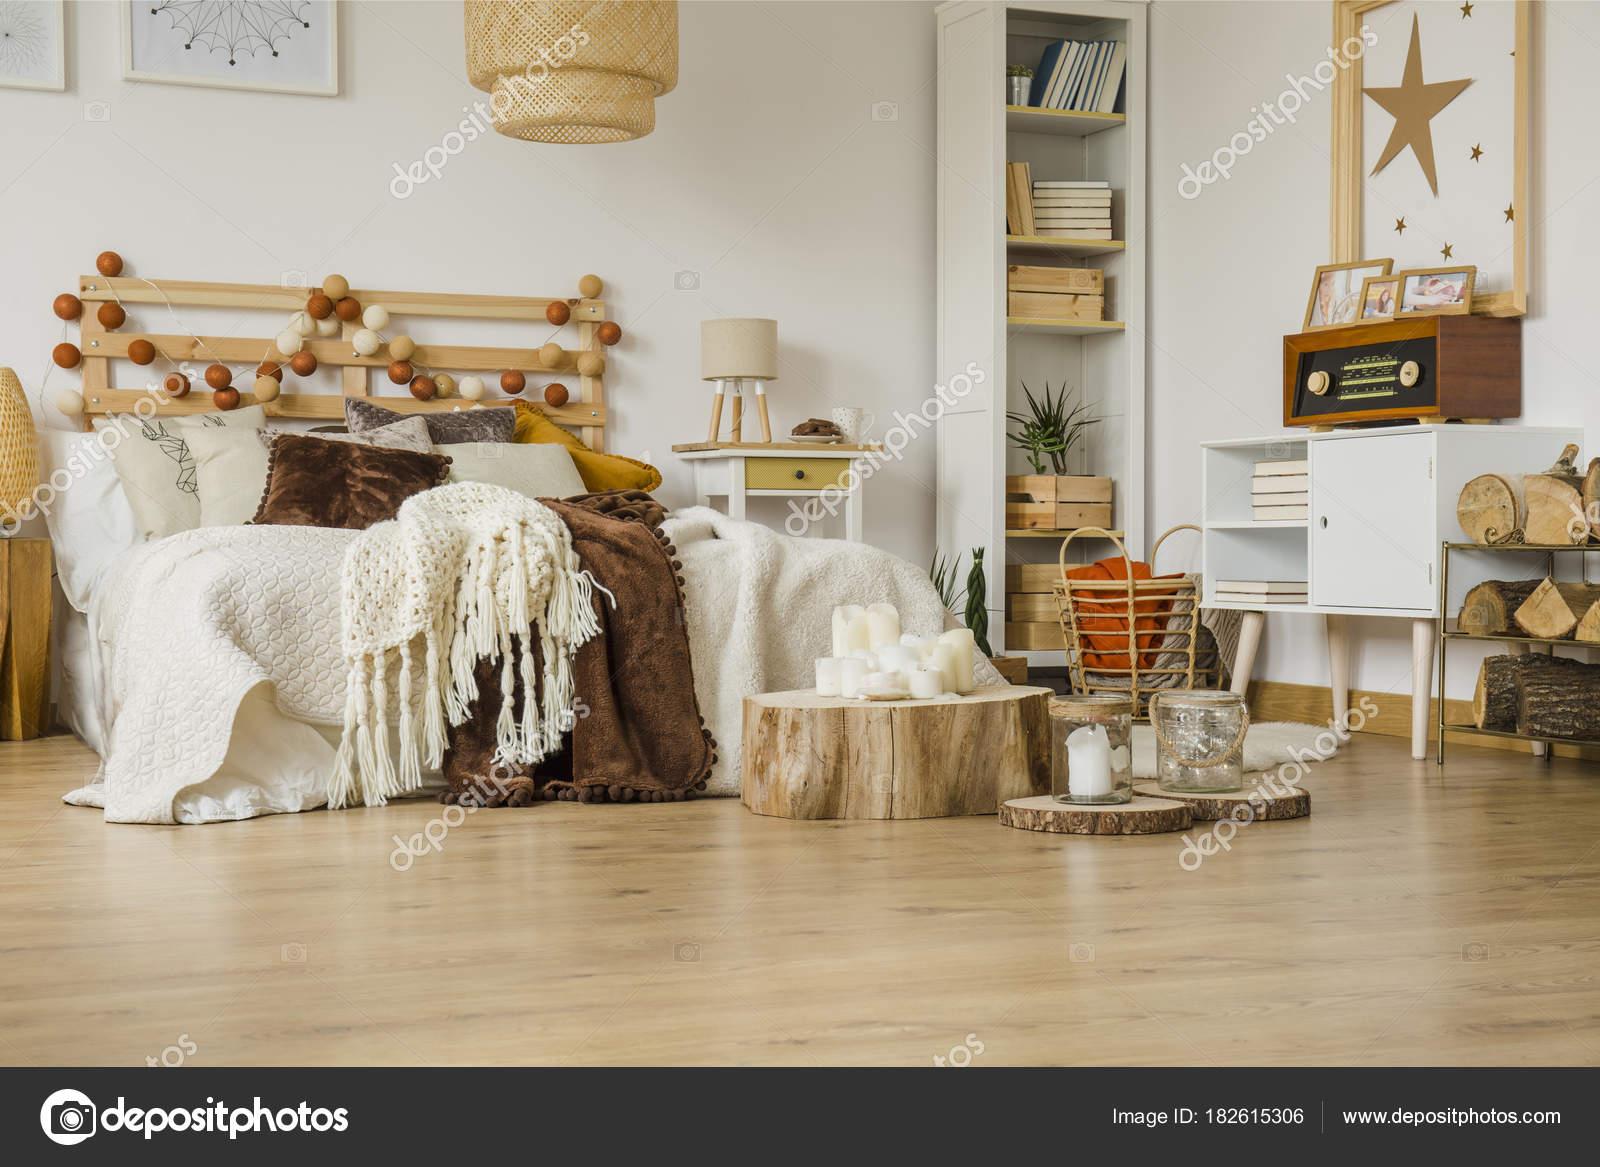 Slaapkamer Met Hout : Hout in gezellige slaapkamer interieur u2014 stockfoto © photographee.eu